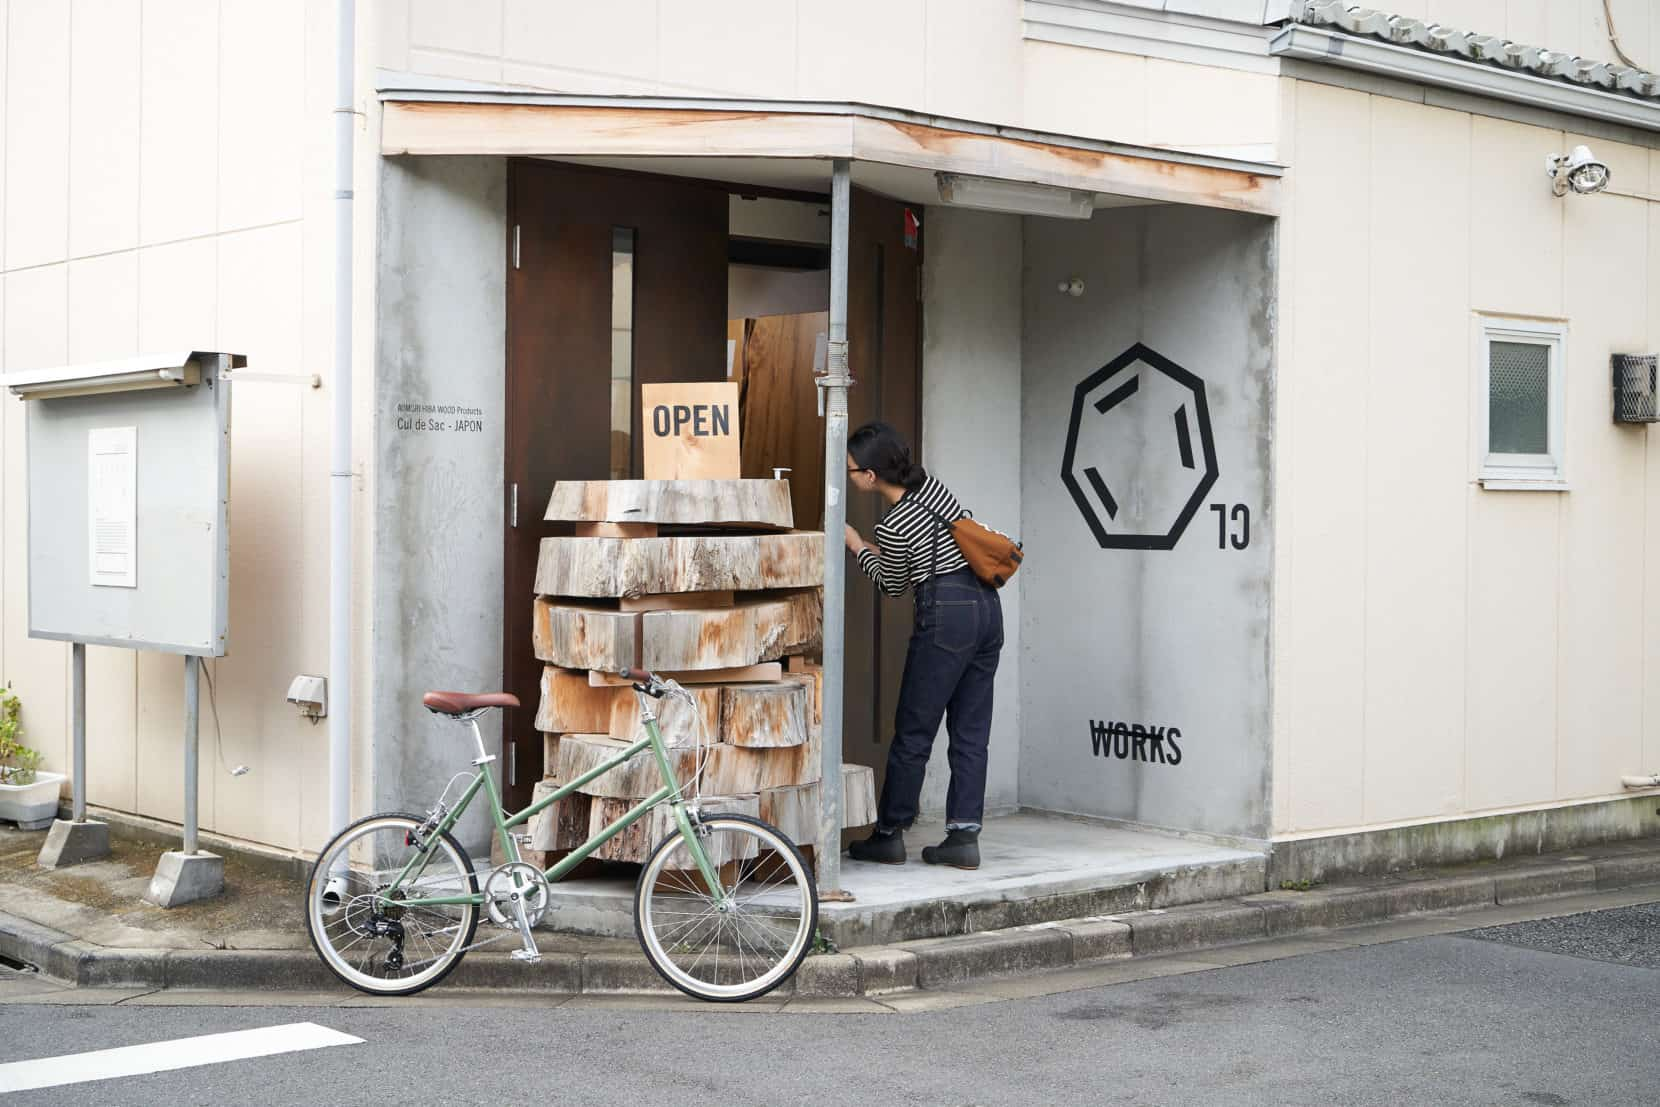 TOKYOBIKE CALIN LIMITED ARTICHOKEとおしゃれなお店に入る女性